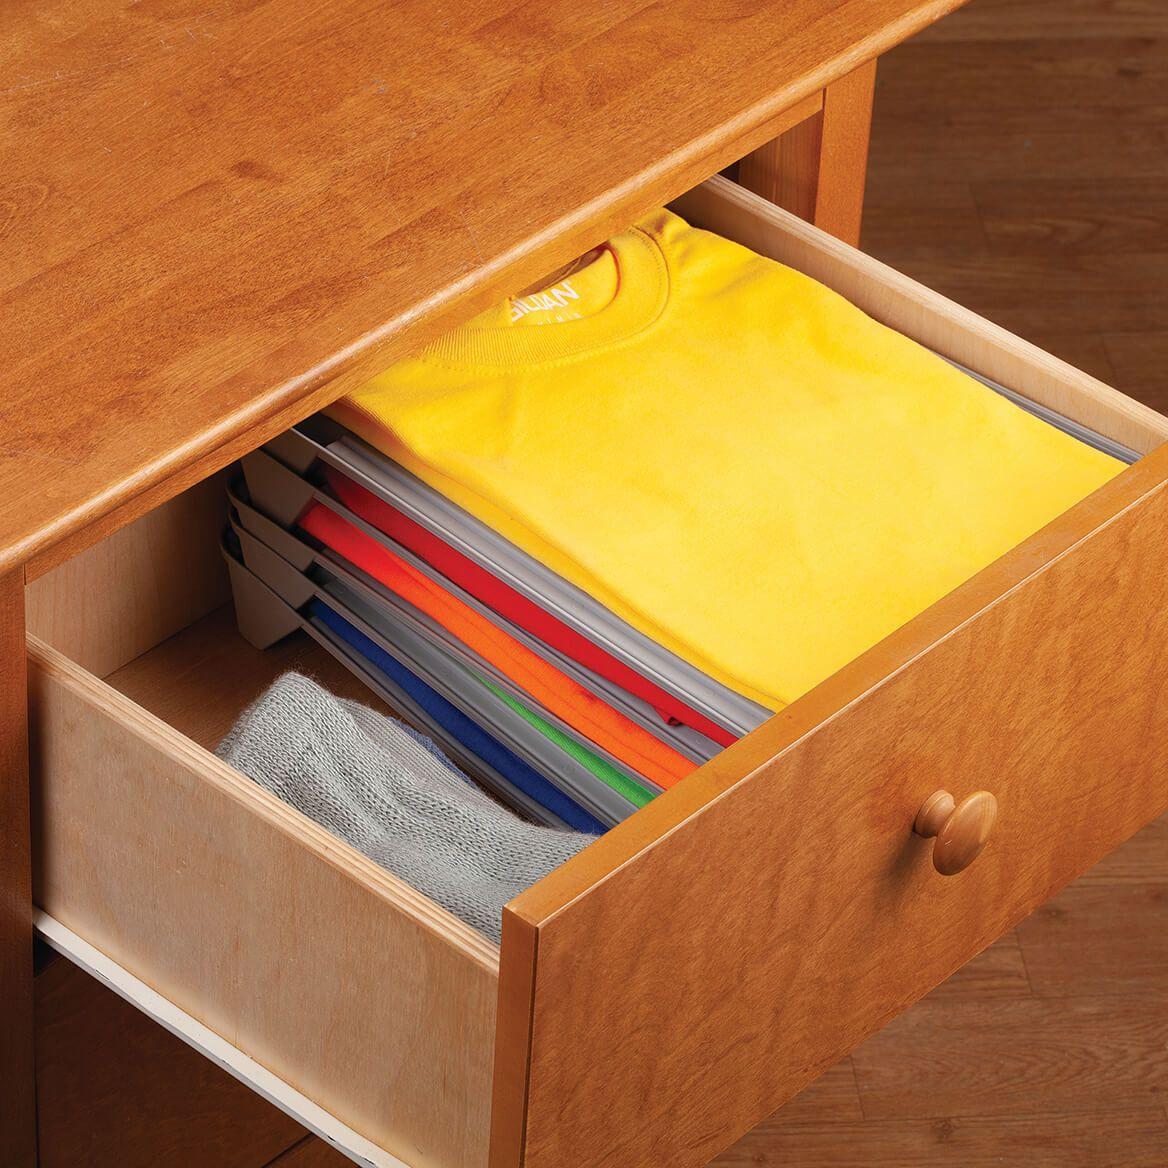 Stackable Shirt Organizer set of 10-370877